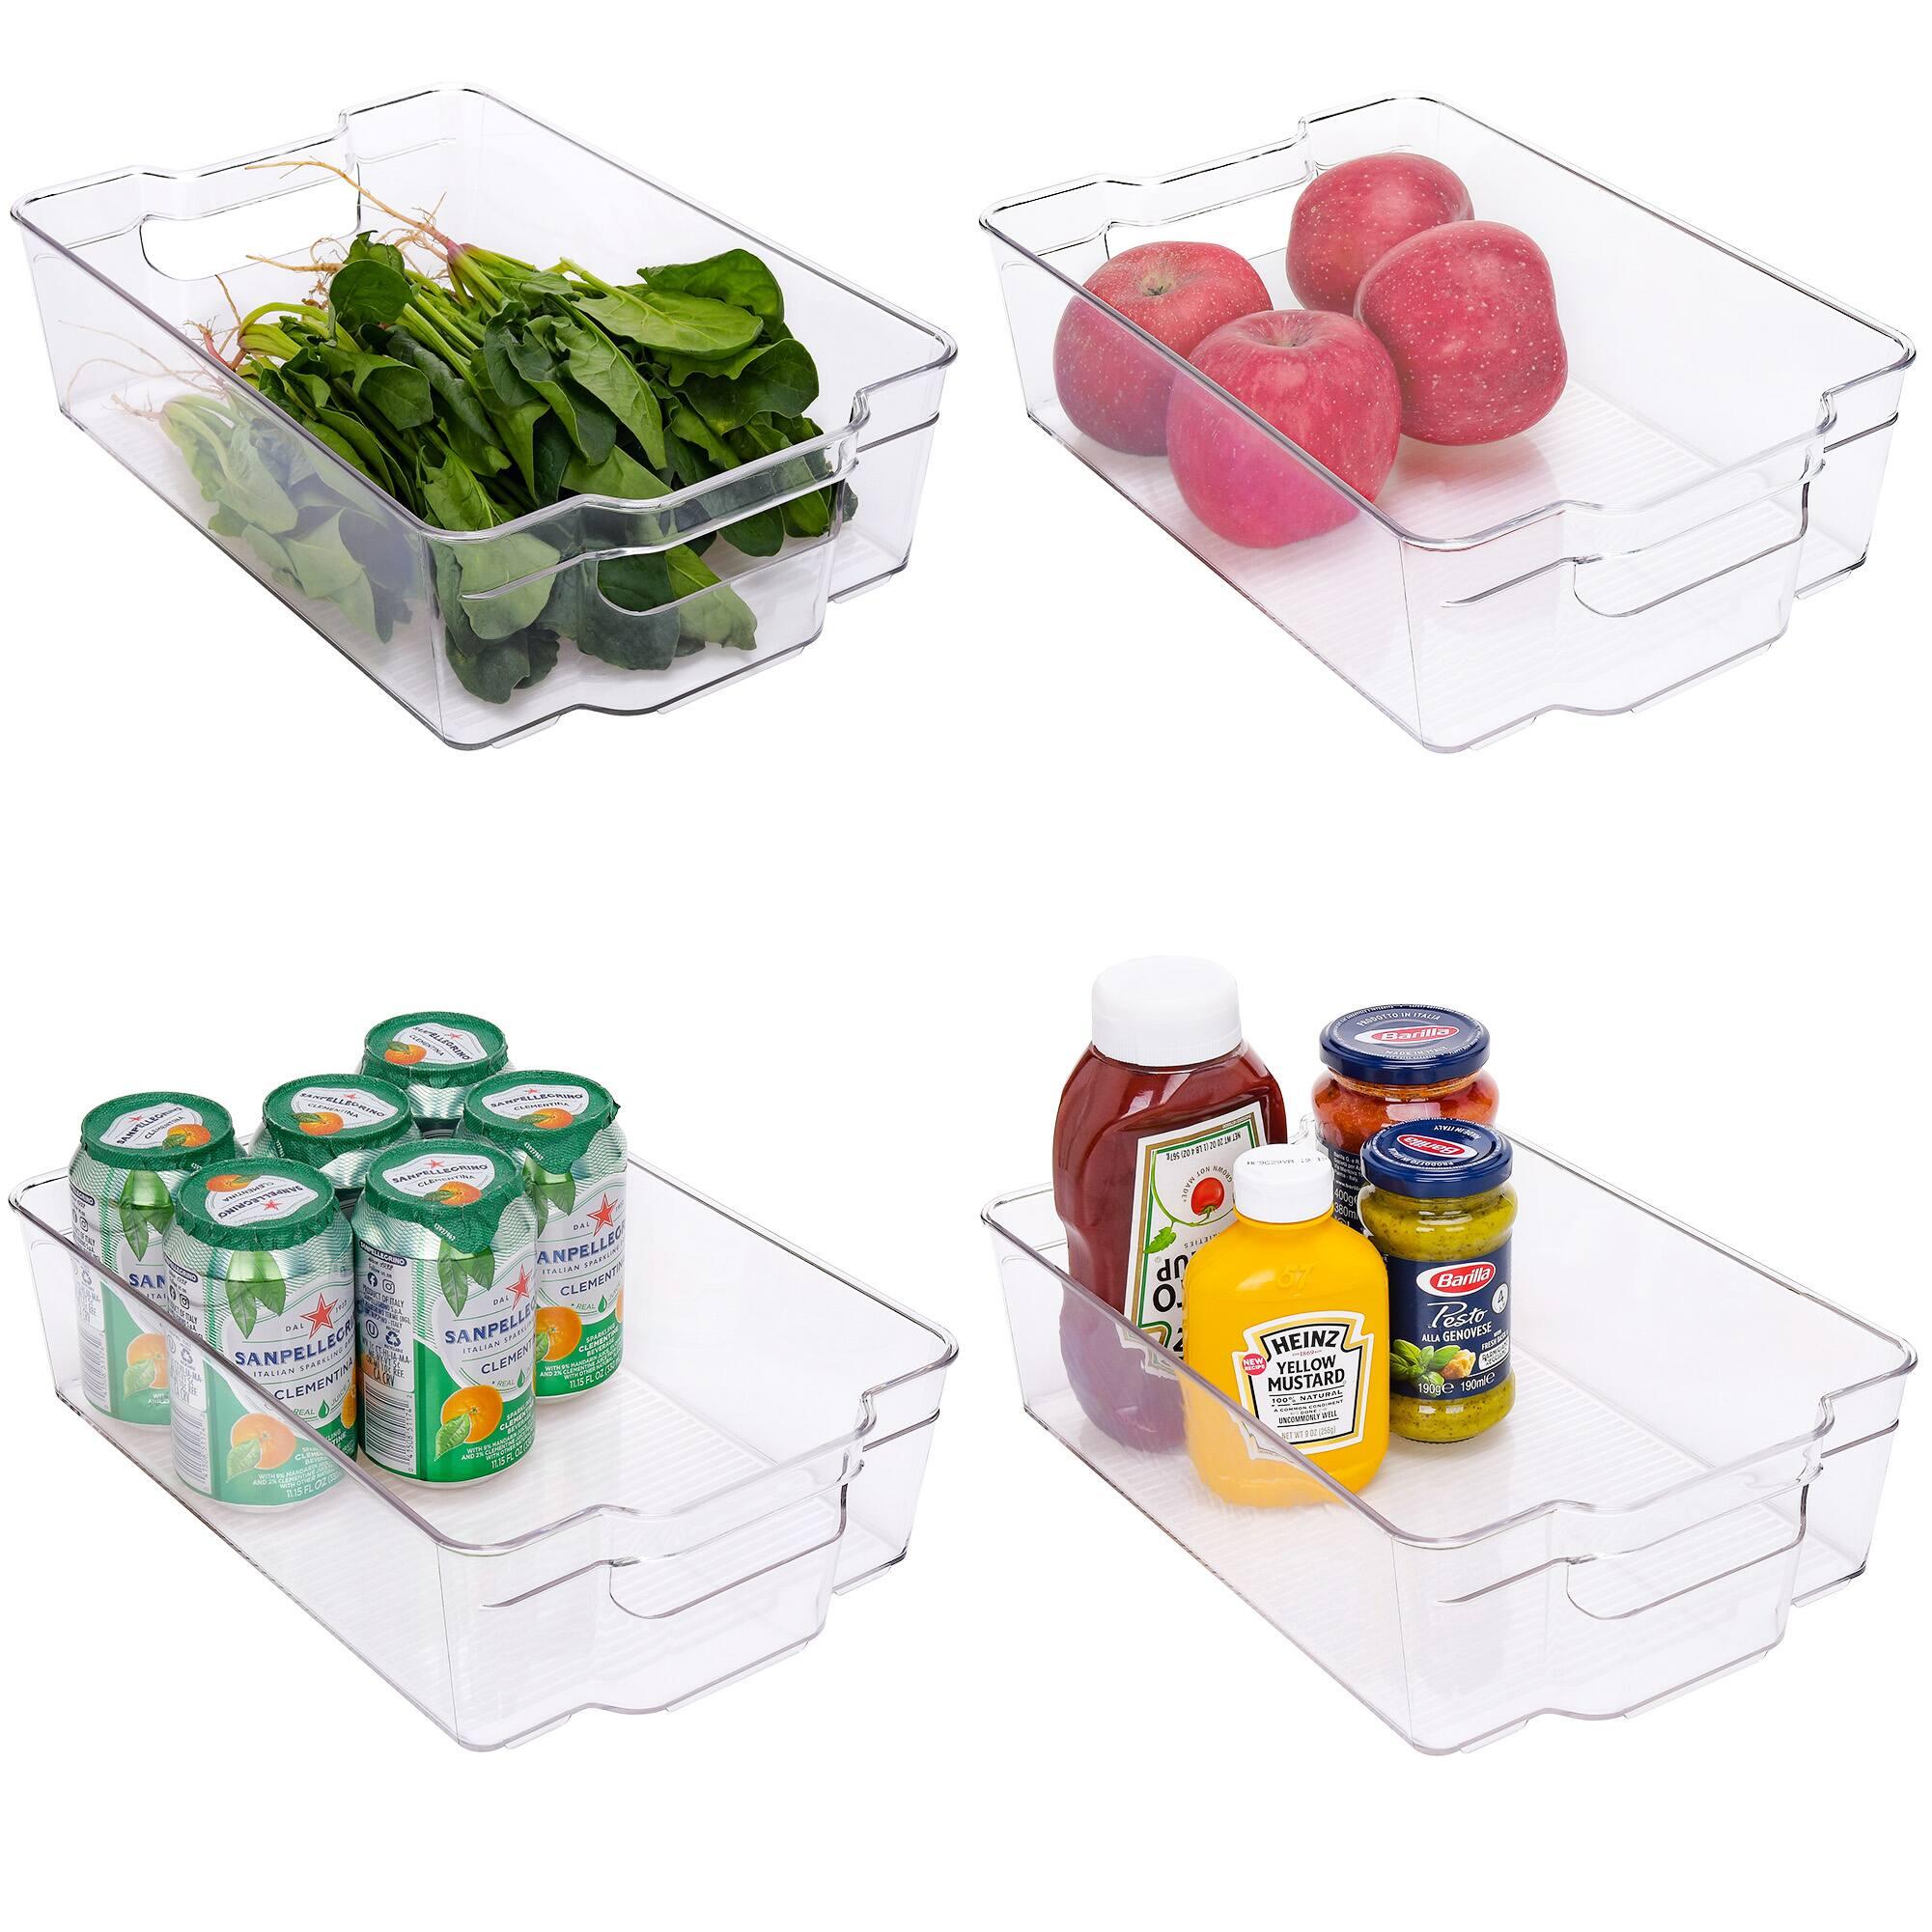 StorageWorks Stackable Fridge Organizer, Refrigerator Storage Bins, BPA-Free, 4-Pack $15.59 + Free Shipping w/ Amazon Prime or Orders $25+